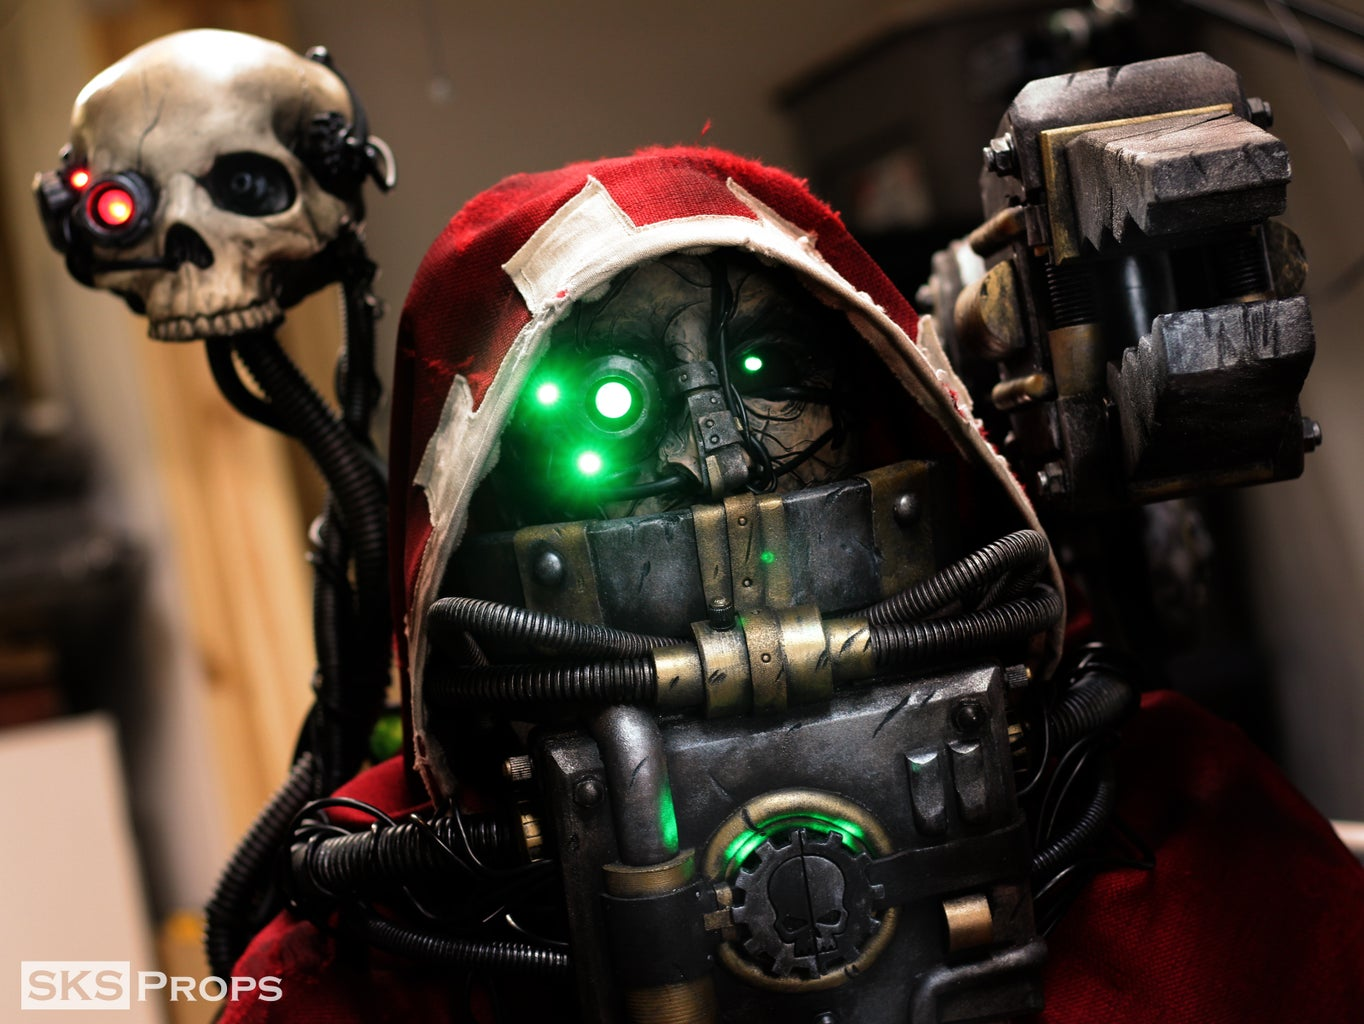 Warhammer 40K Tech Priest Cosplay - SKS Props